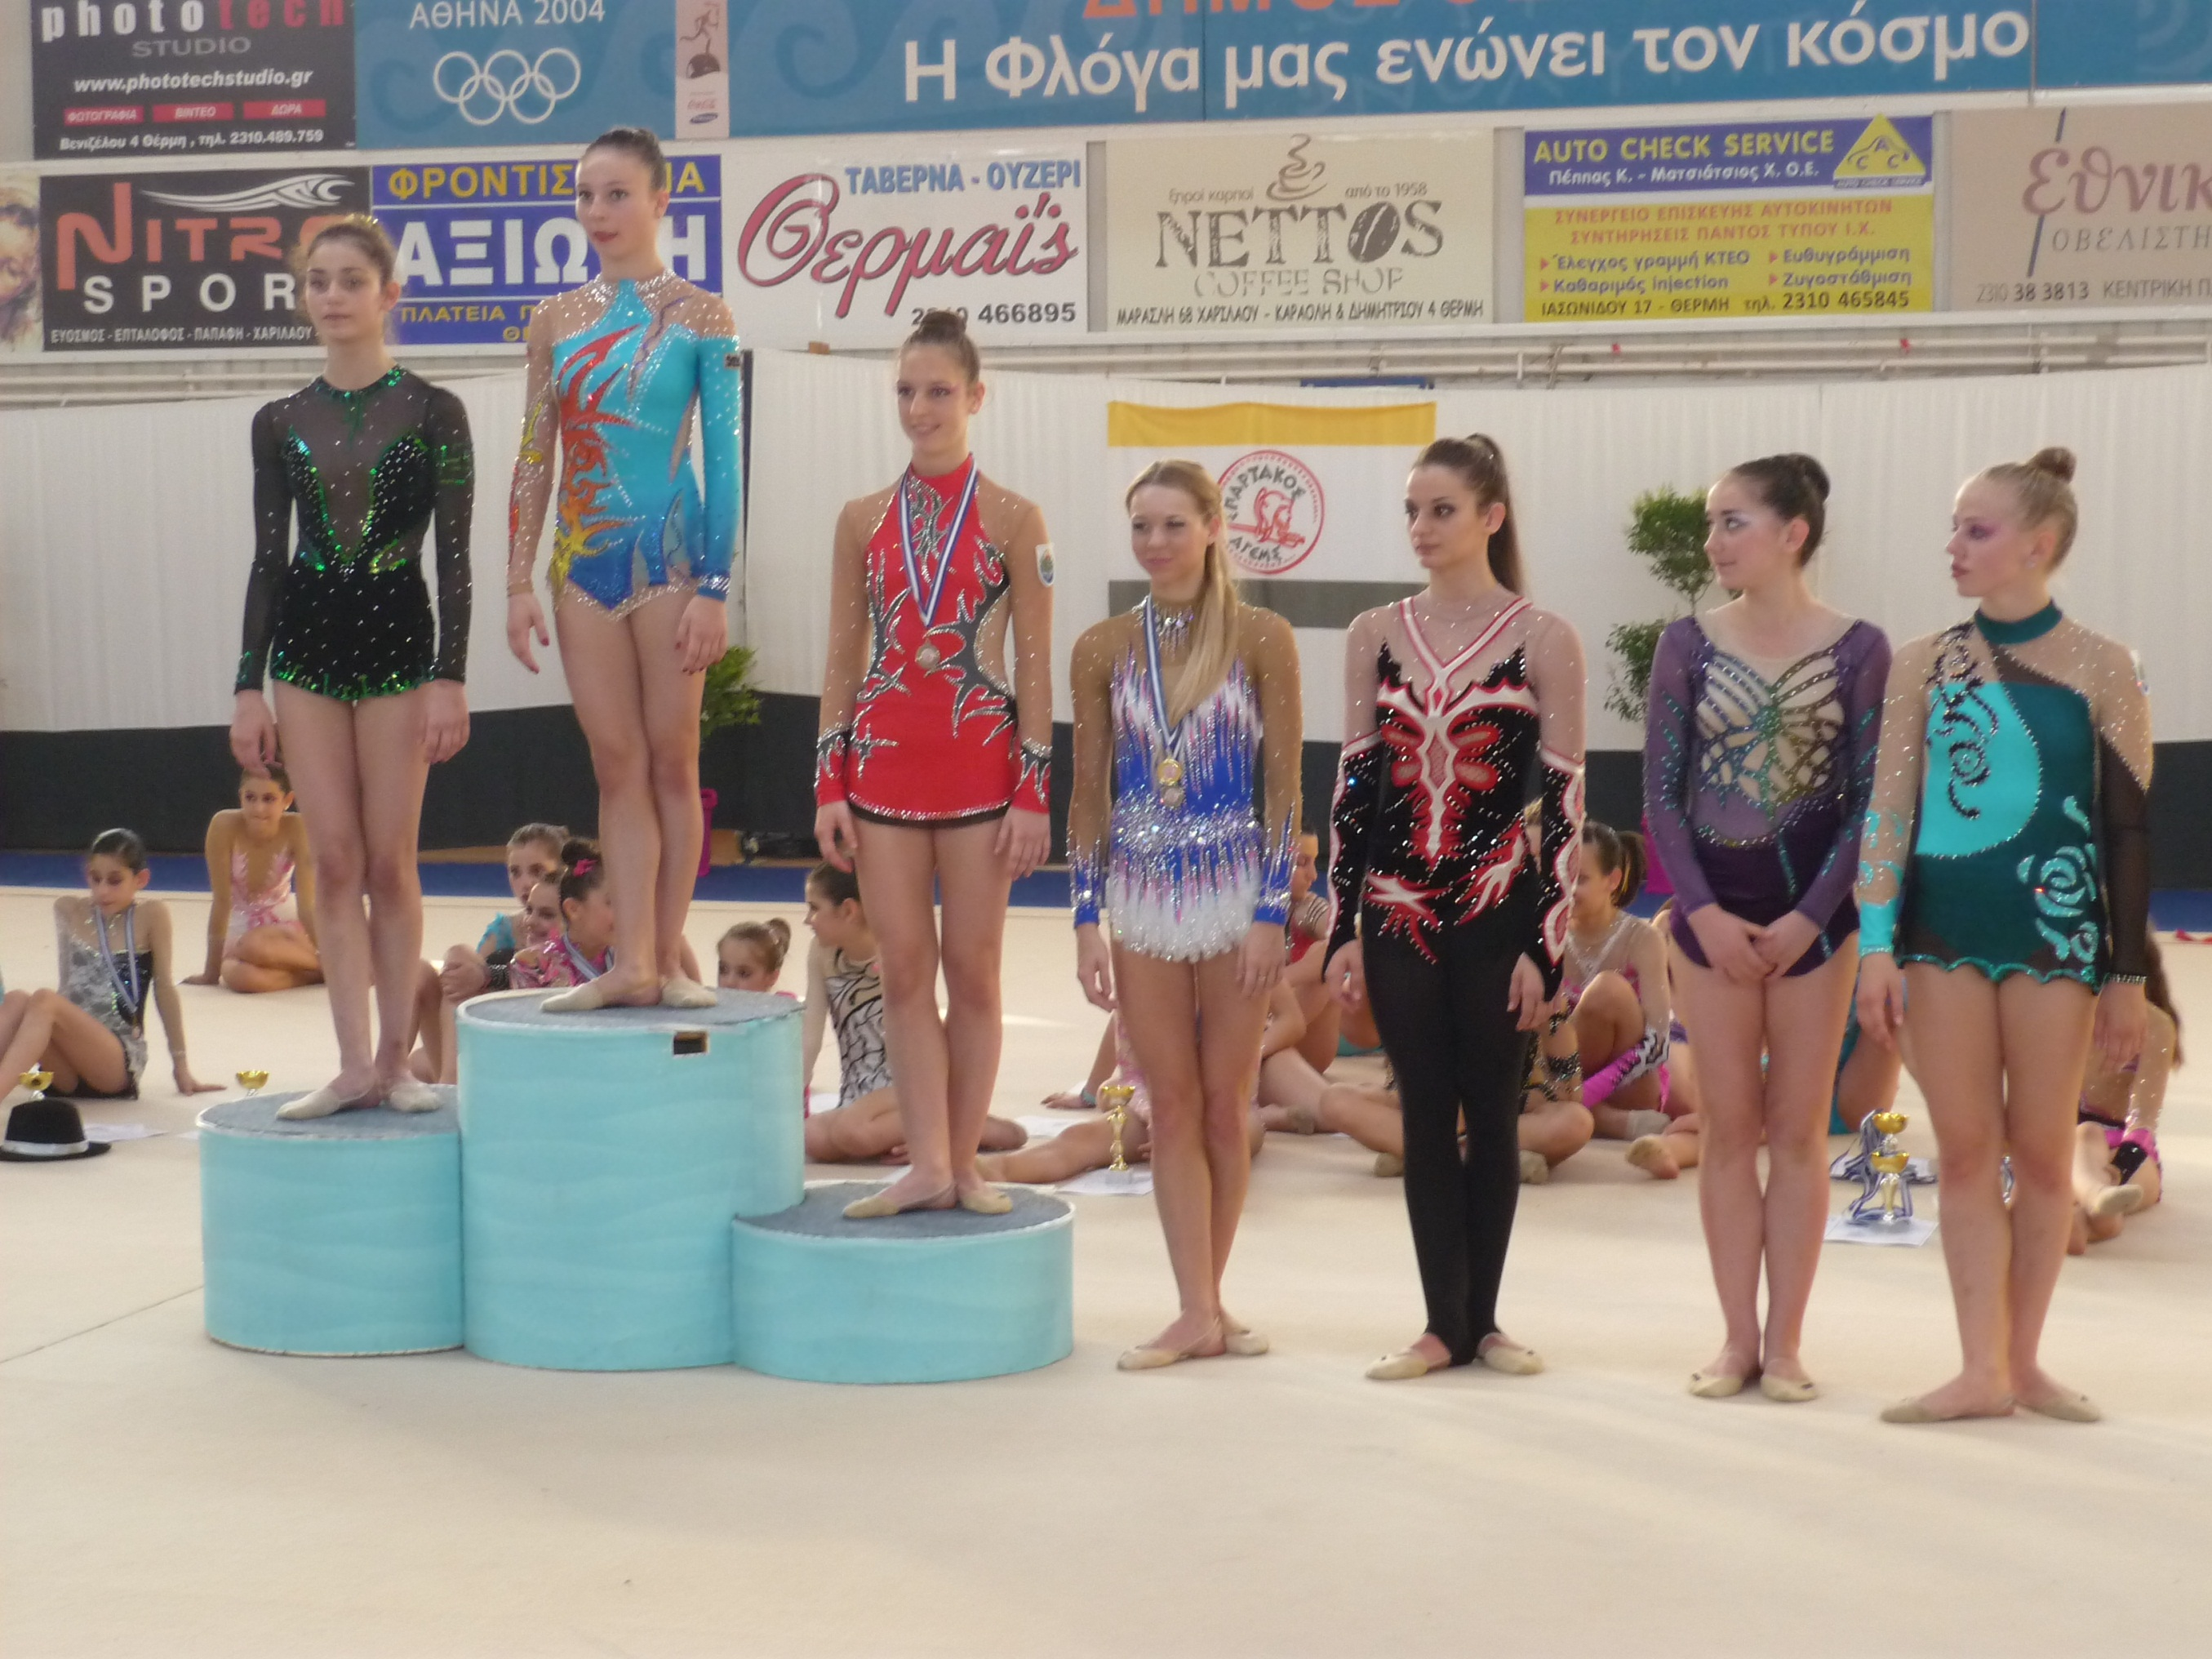 Emeralds Cup 2012 - Grecia